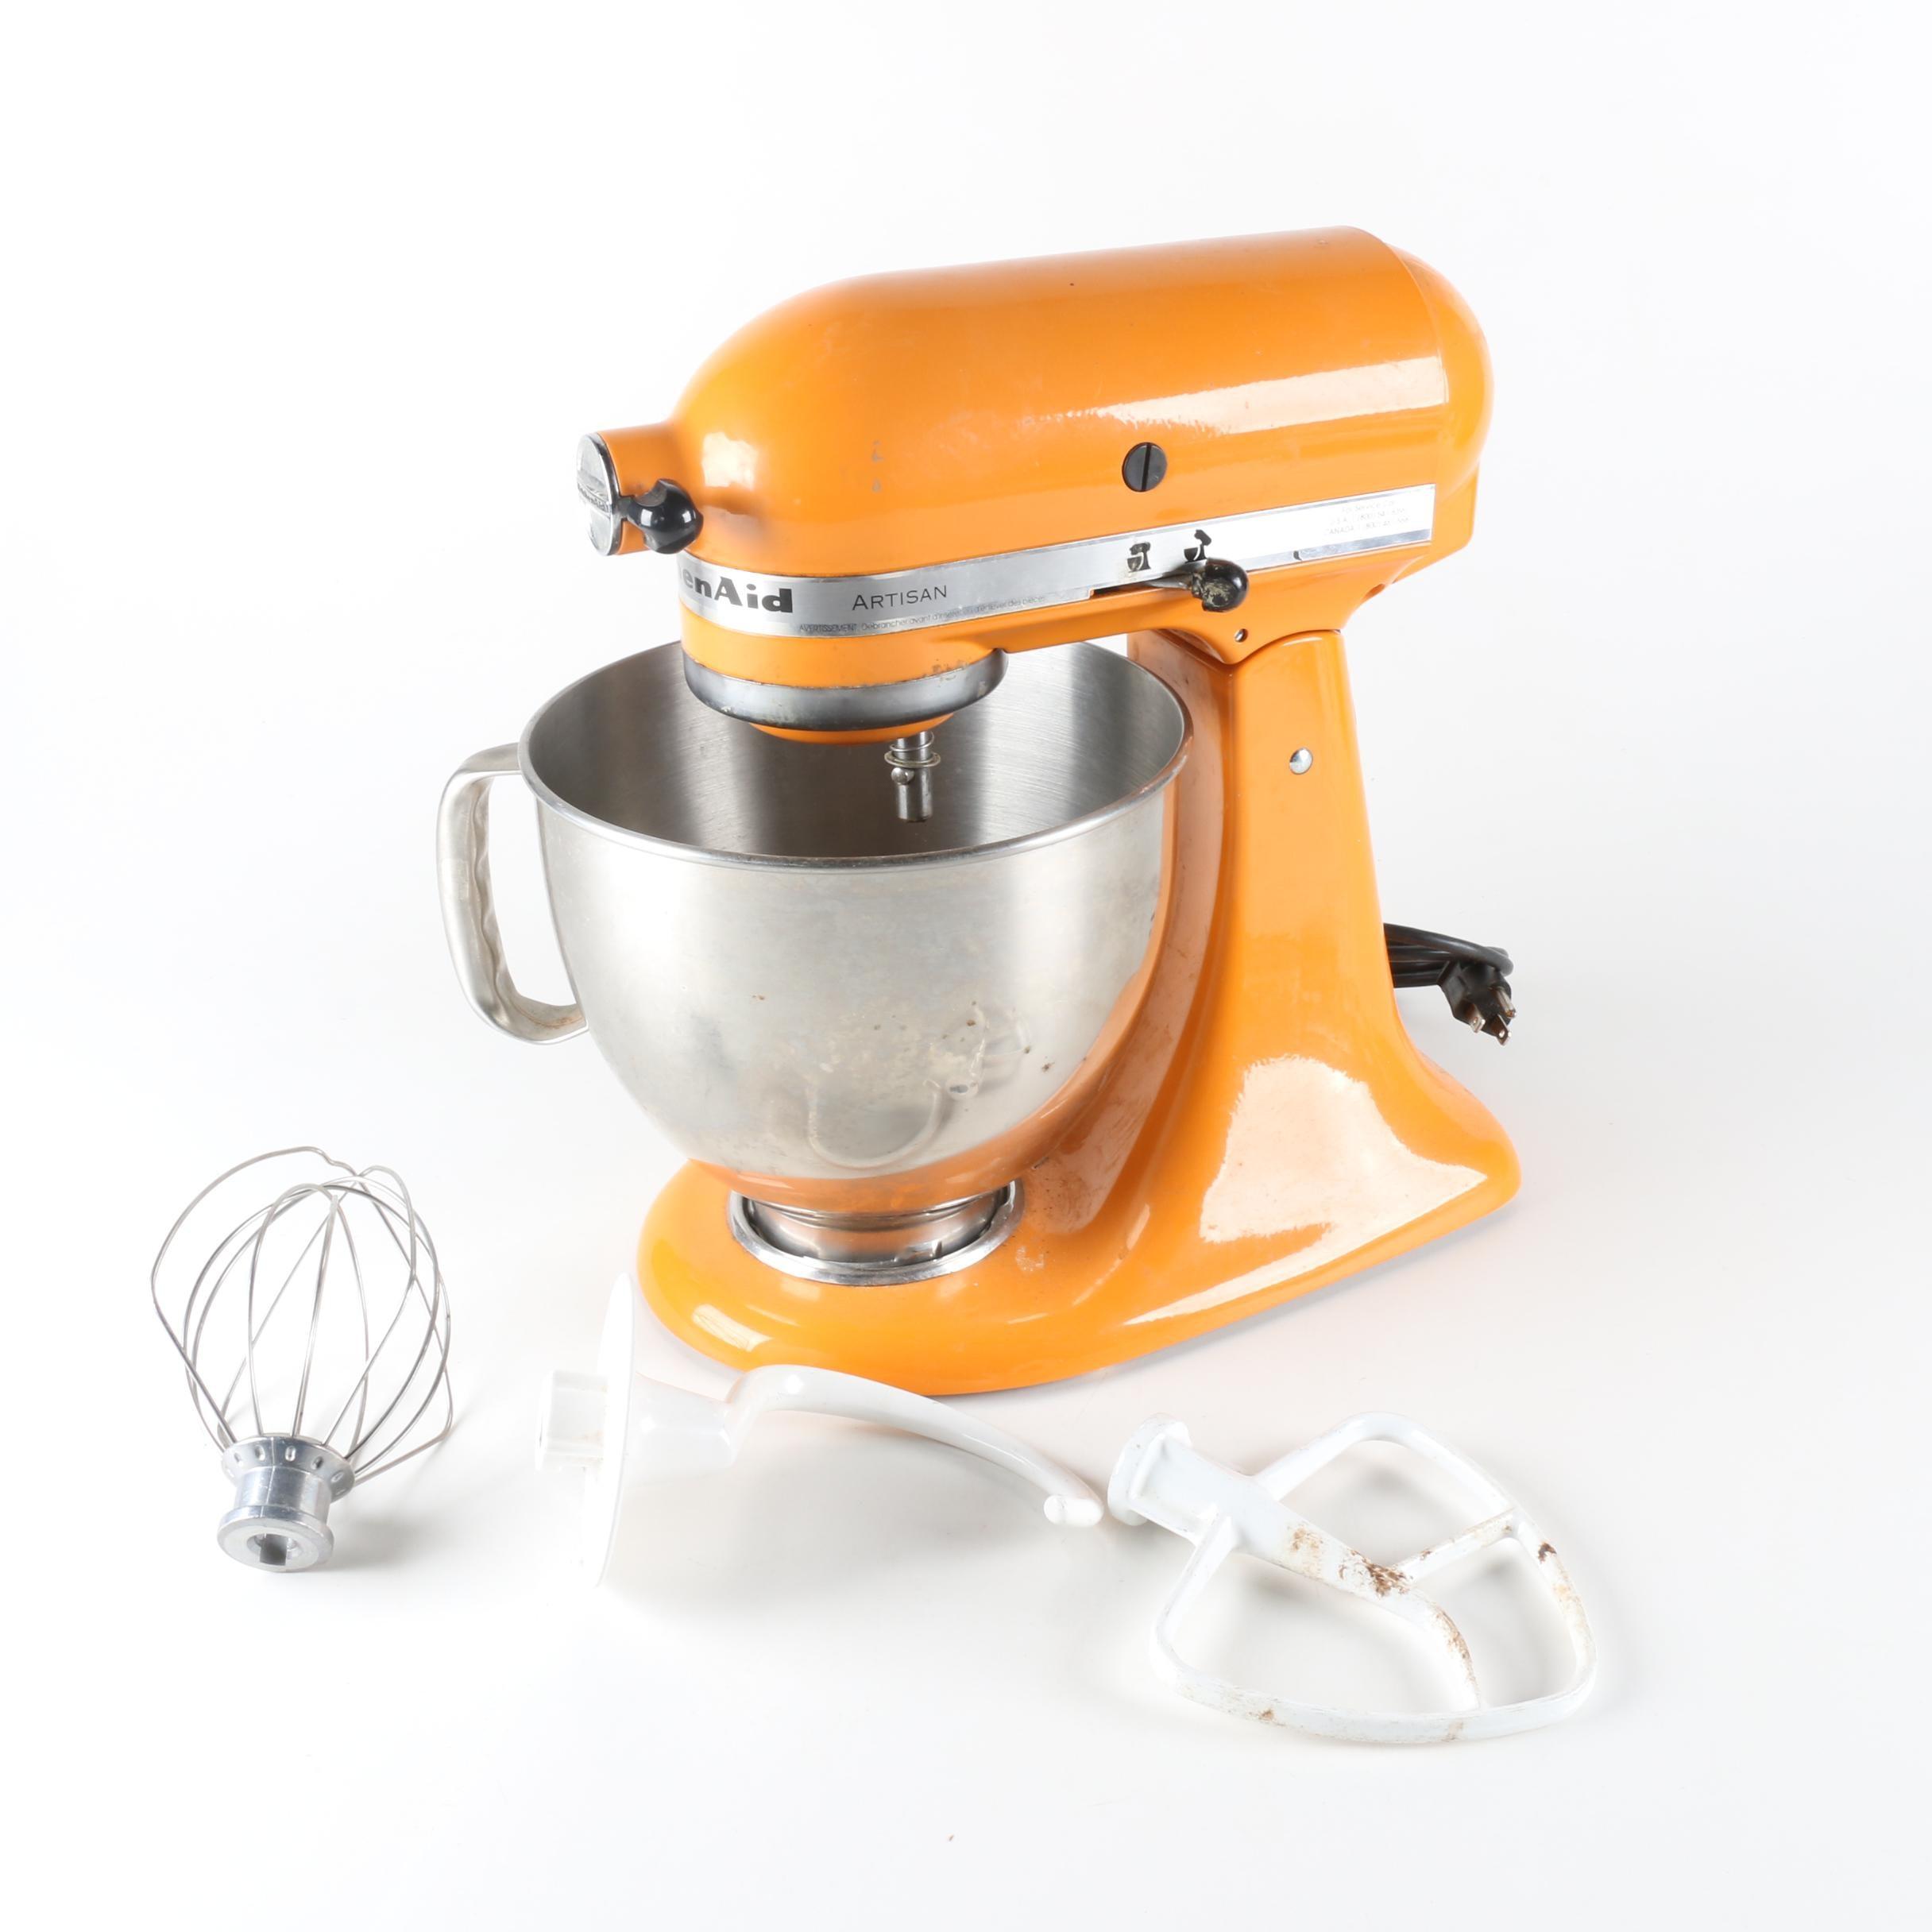 kitchenaid artisan stand mixer vintage kitchen appliances auctions   used kitchen appliances in      rh   ebth com